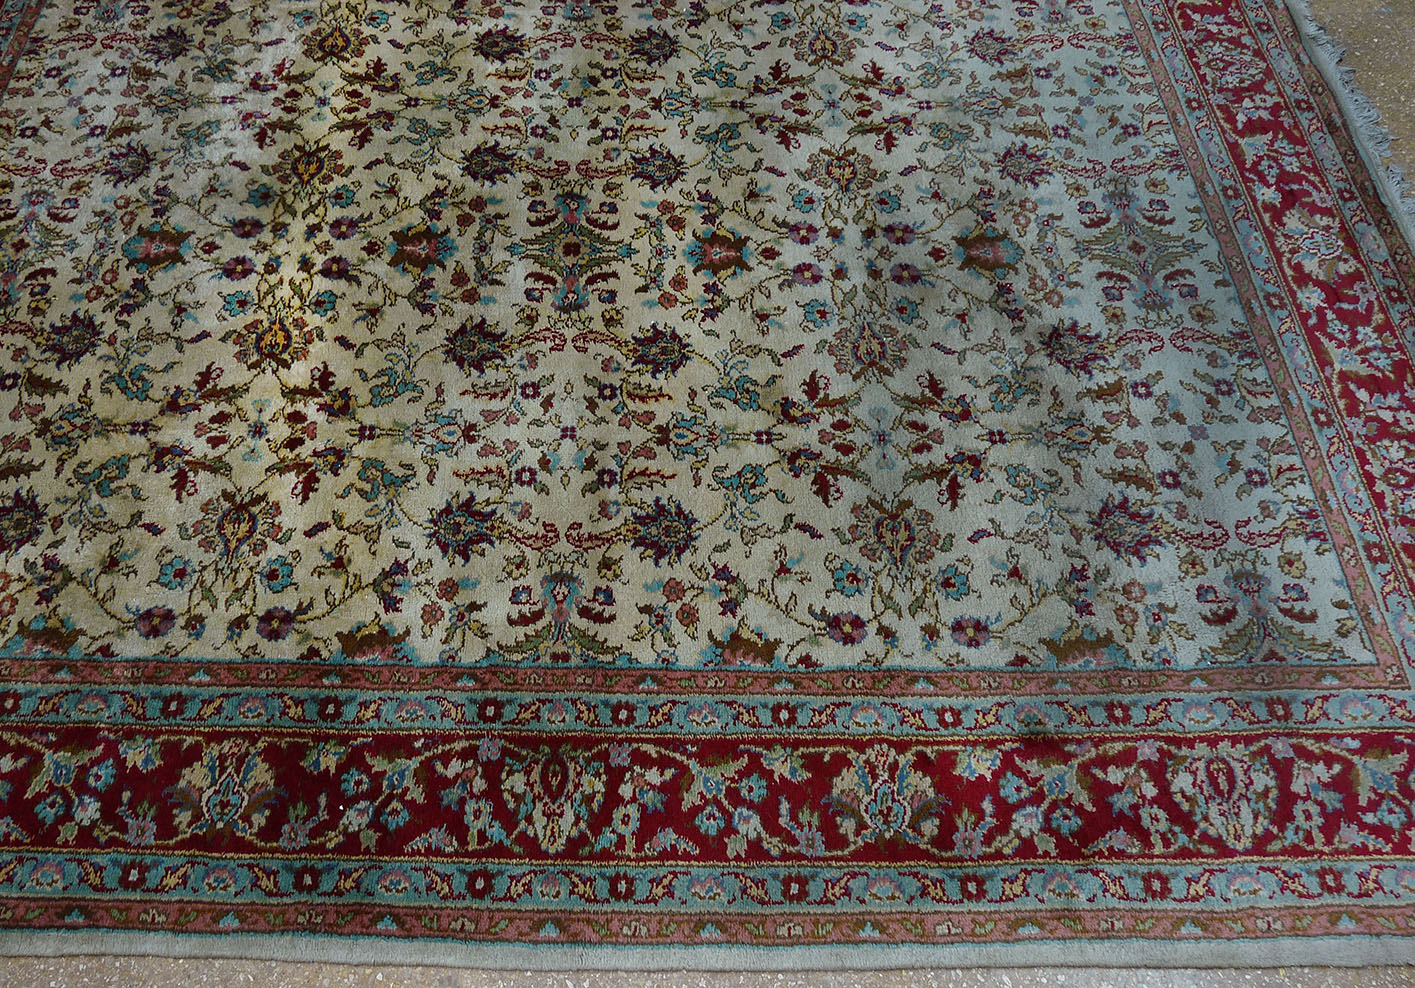 Bgw remate 262 alfombra gek htm gendata for Alfombra persa roja